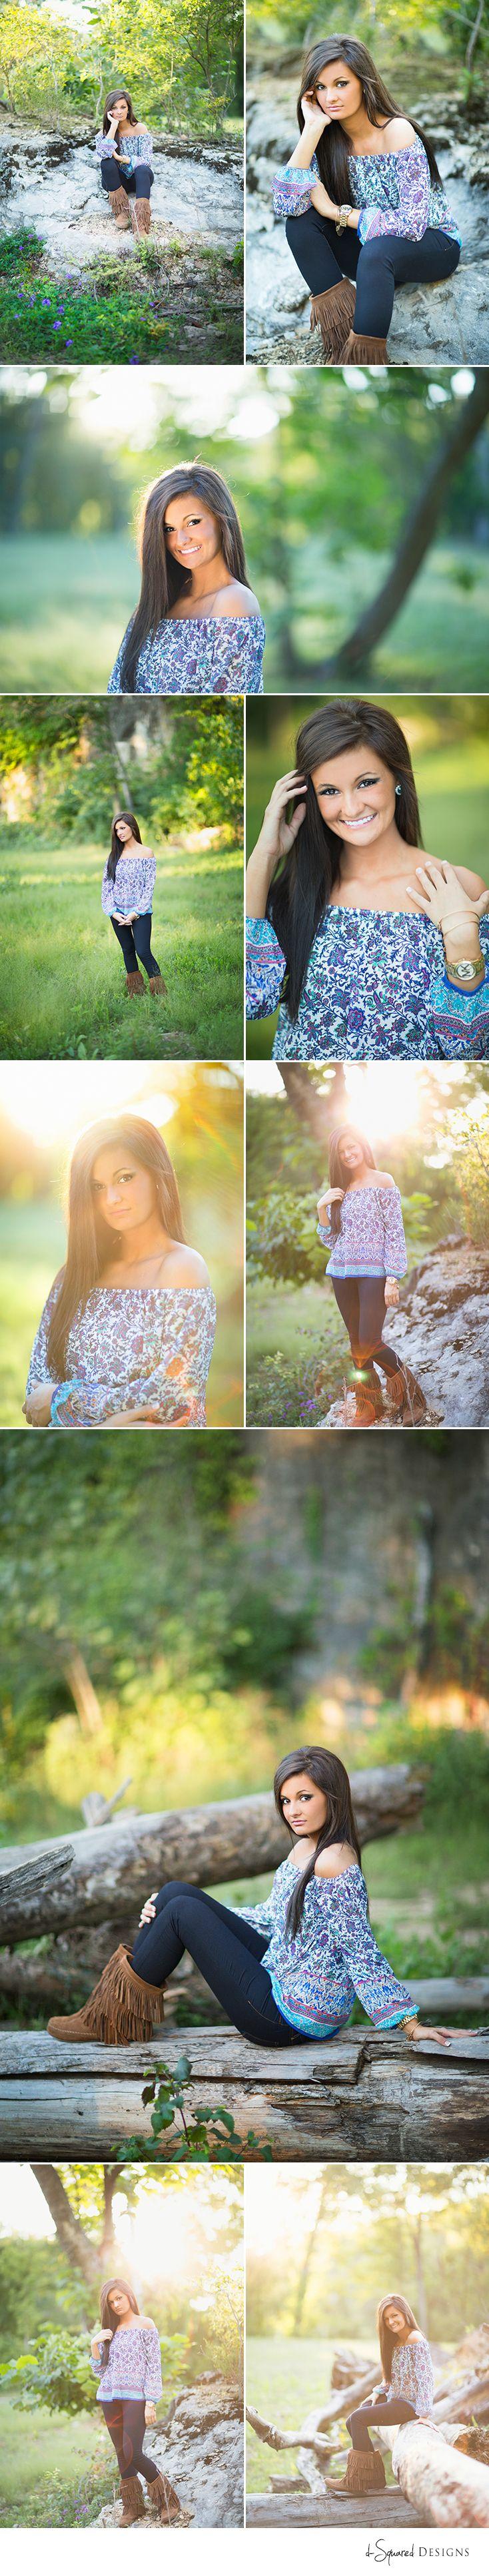 d-Squared Designs St. Louis, Missouri Senior Photography. Fall senior session. Fall senior inspiration. Senior photography. Senior girl.